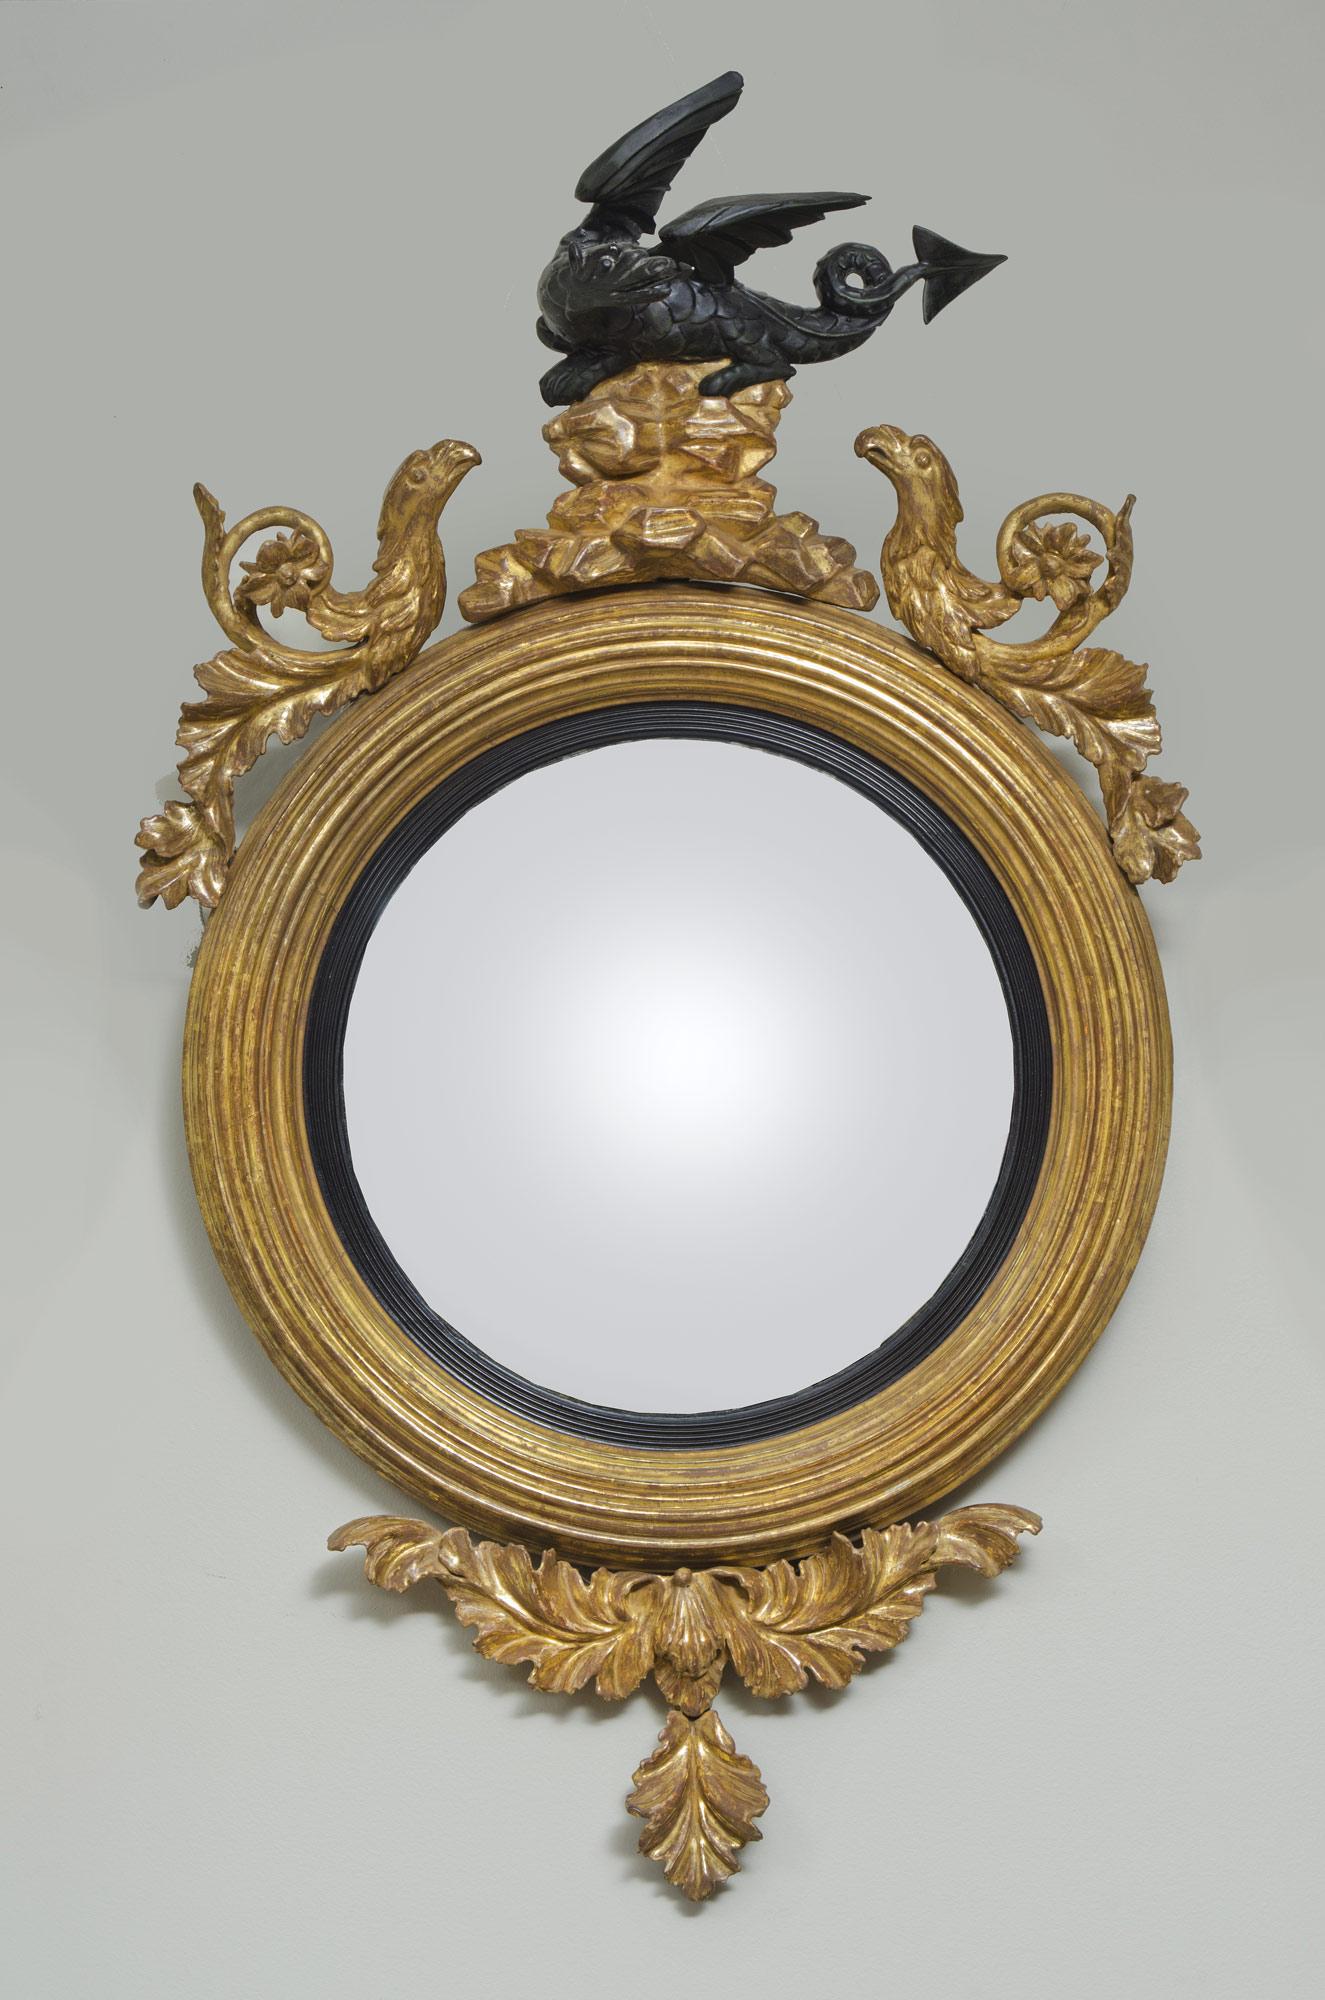 187 Product 187 Regency Convex Mirror 1